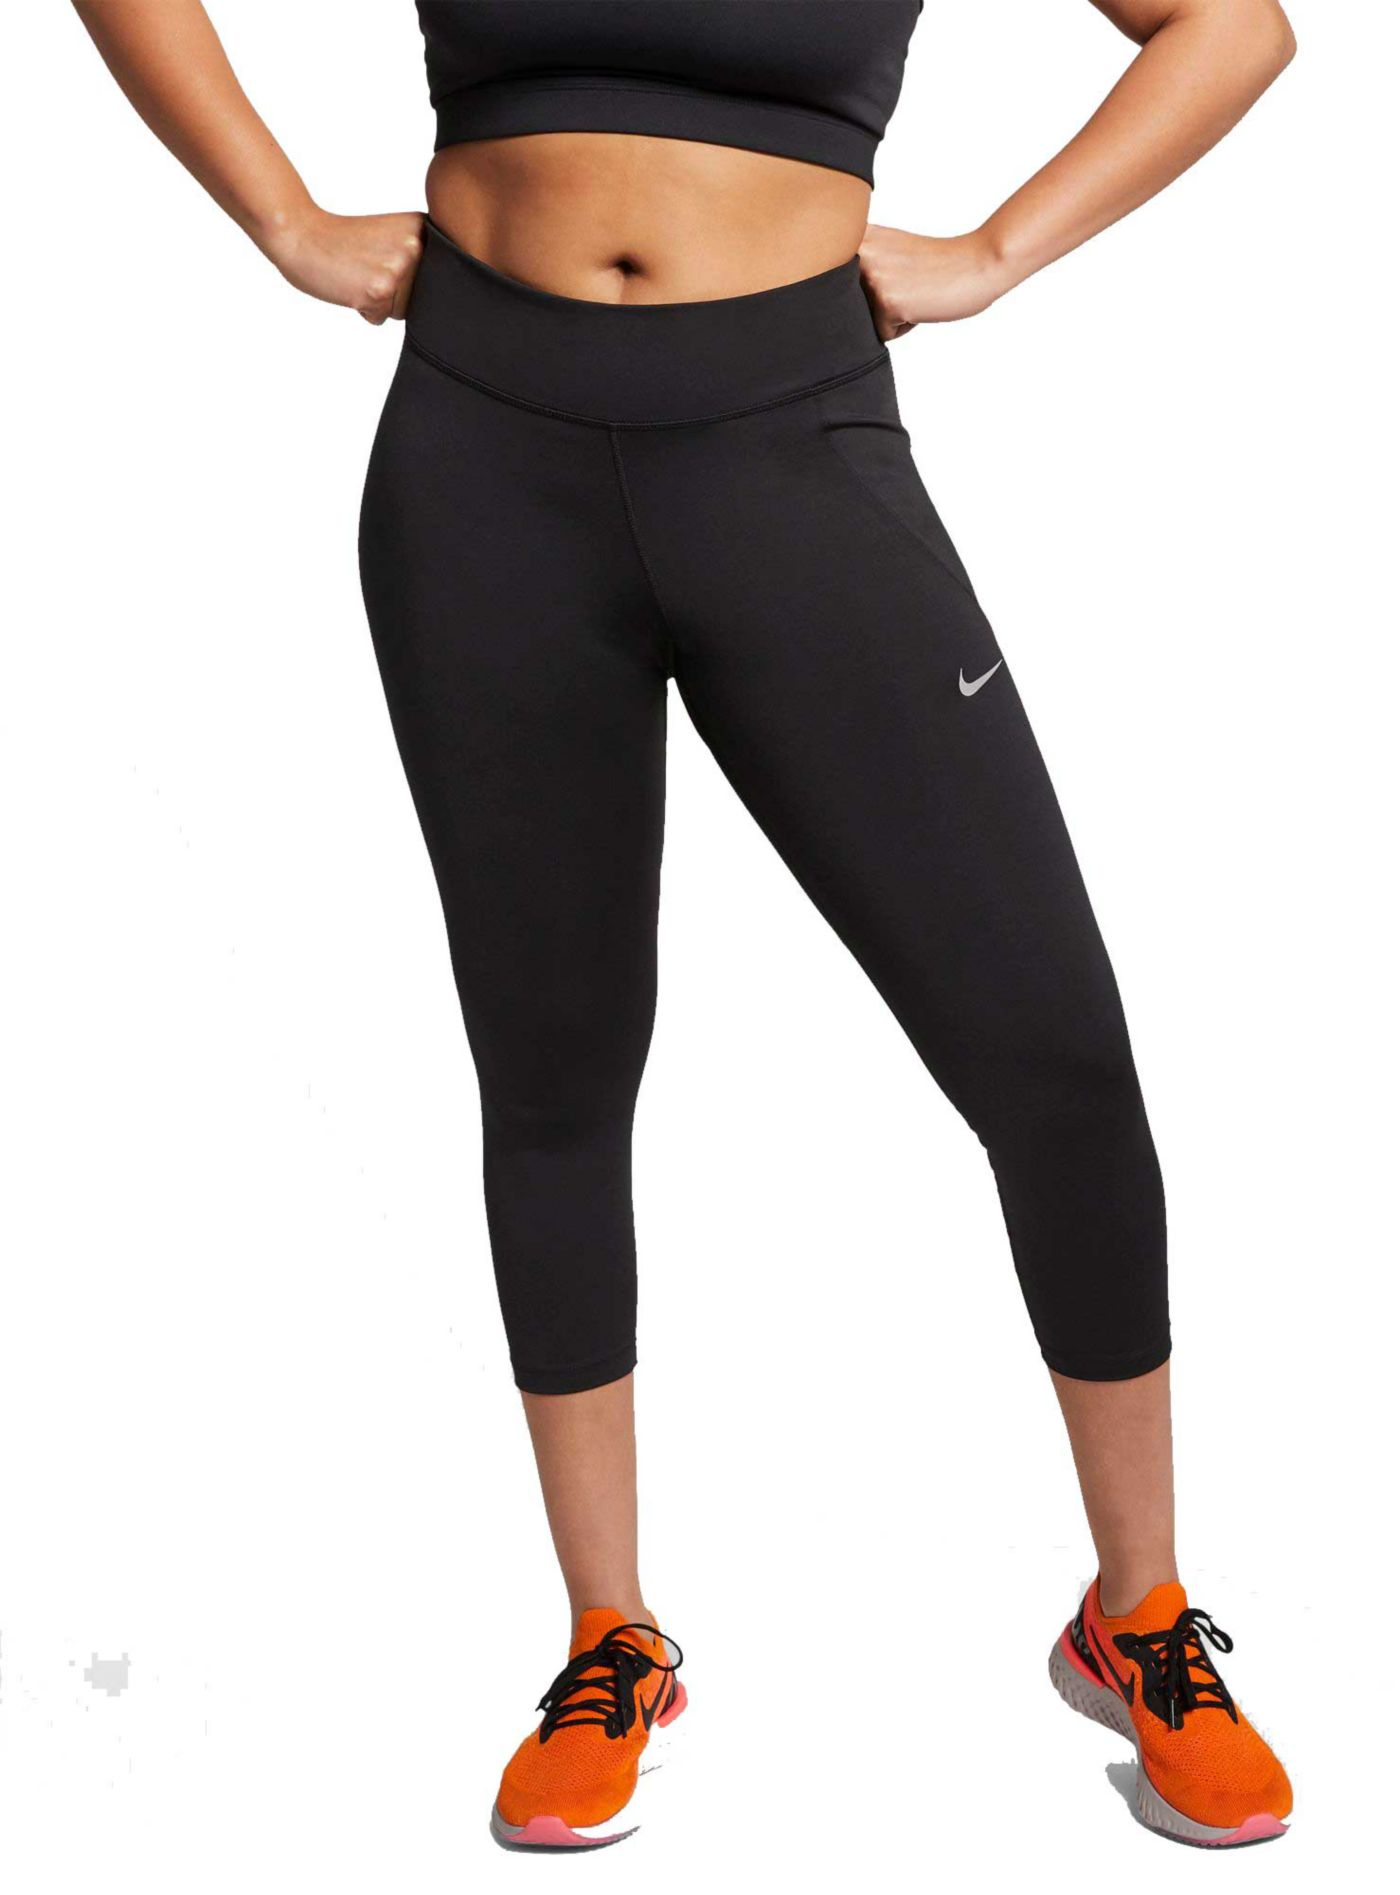 Nike Women's Plus Size Fast 3/4 Running Cropped Leggings